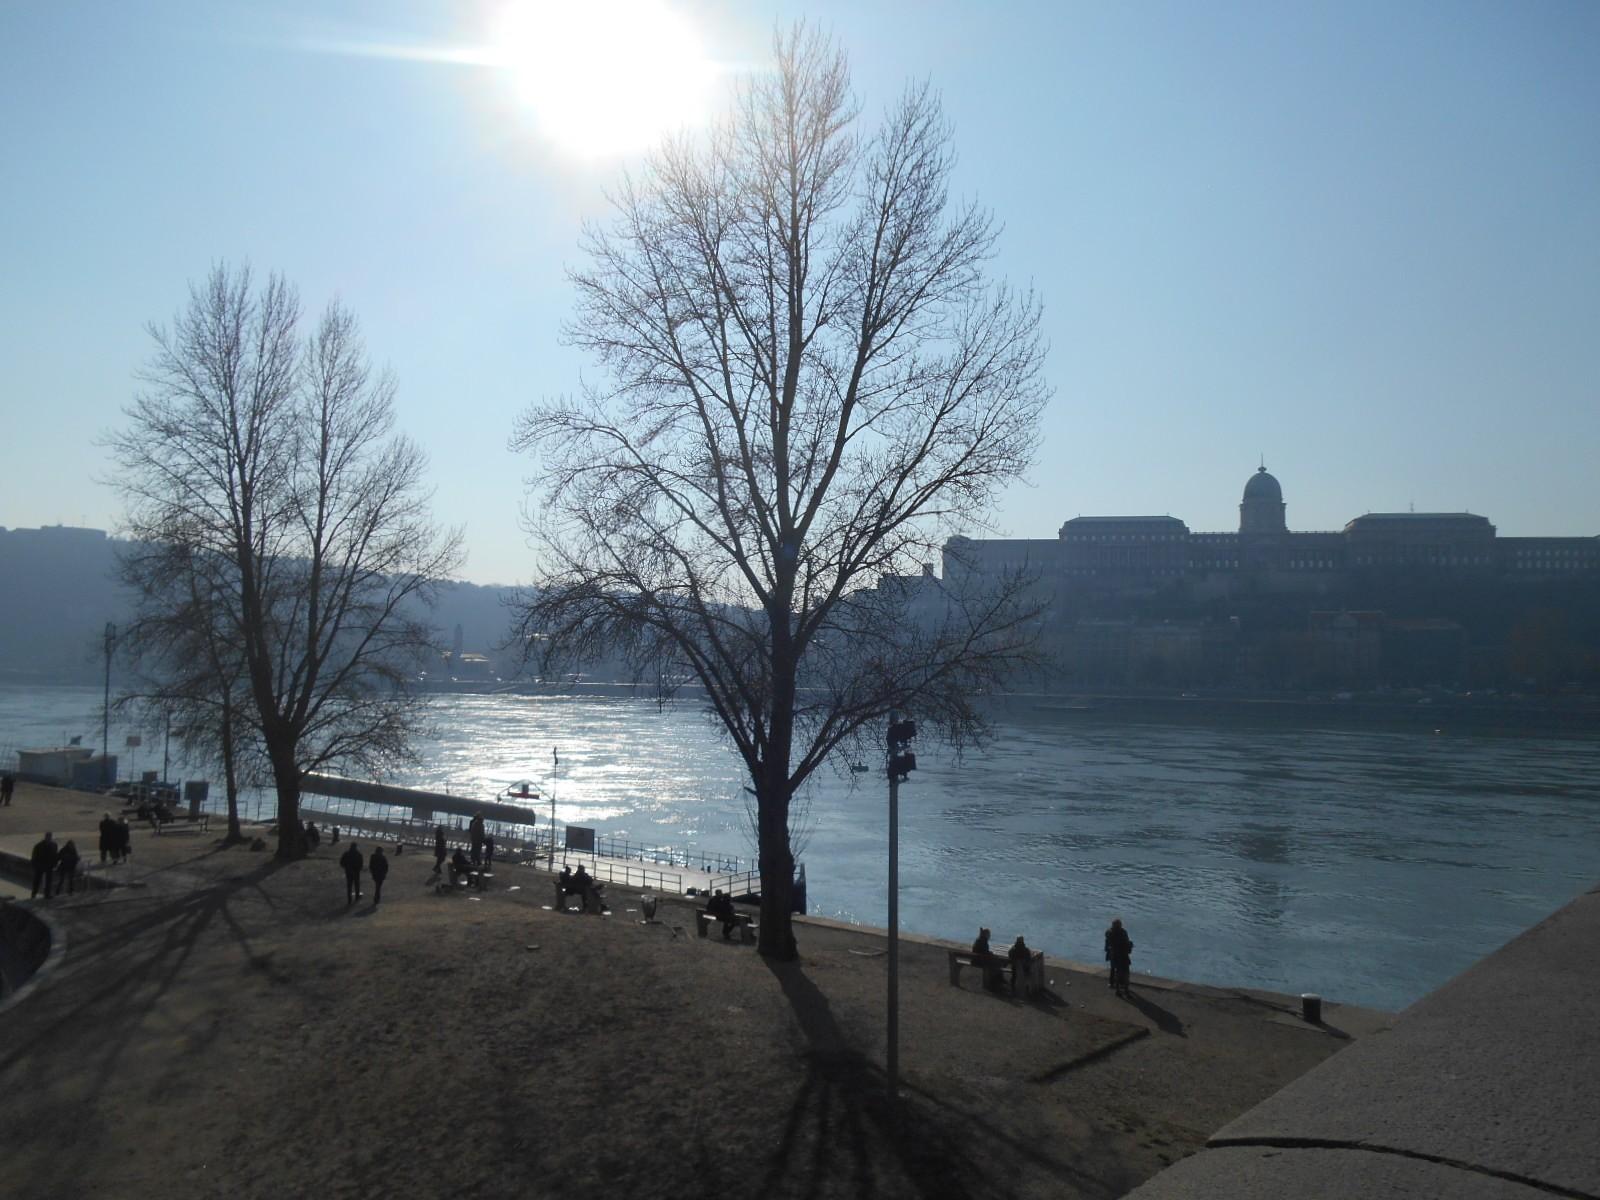 Pored reke